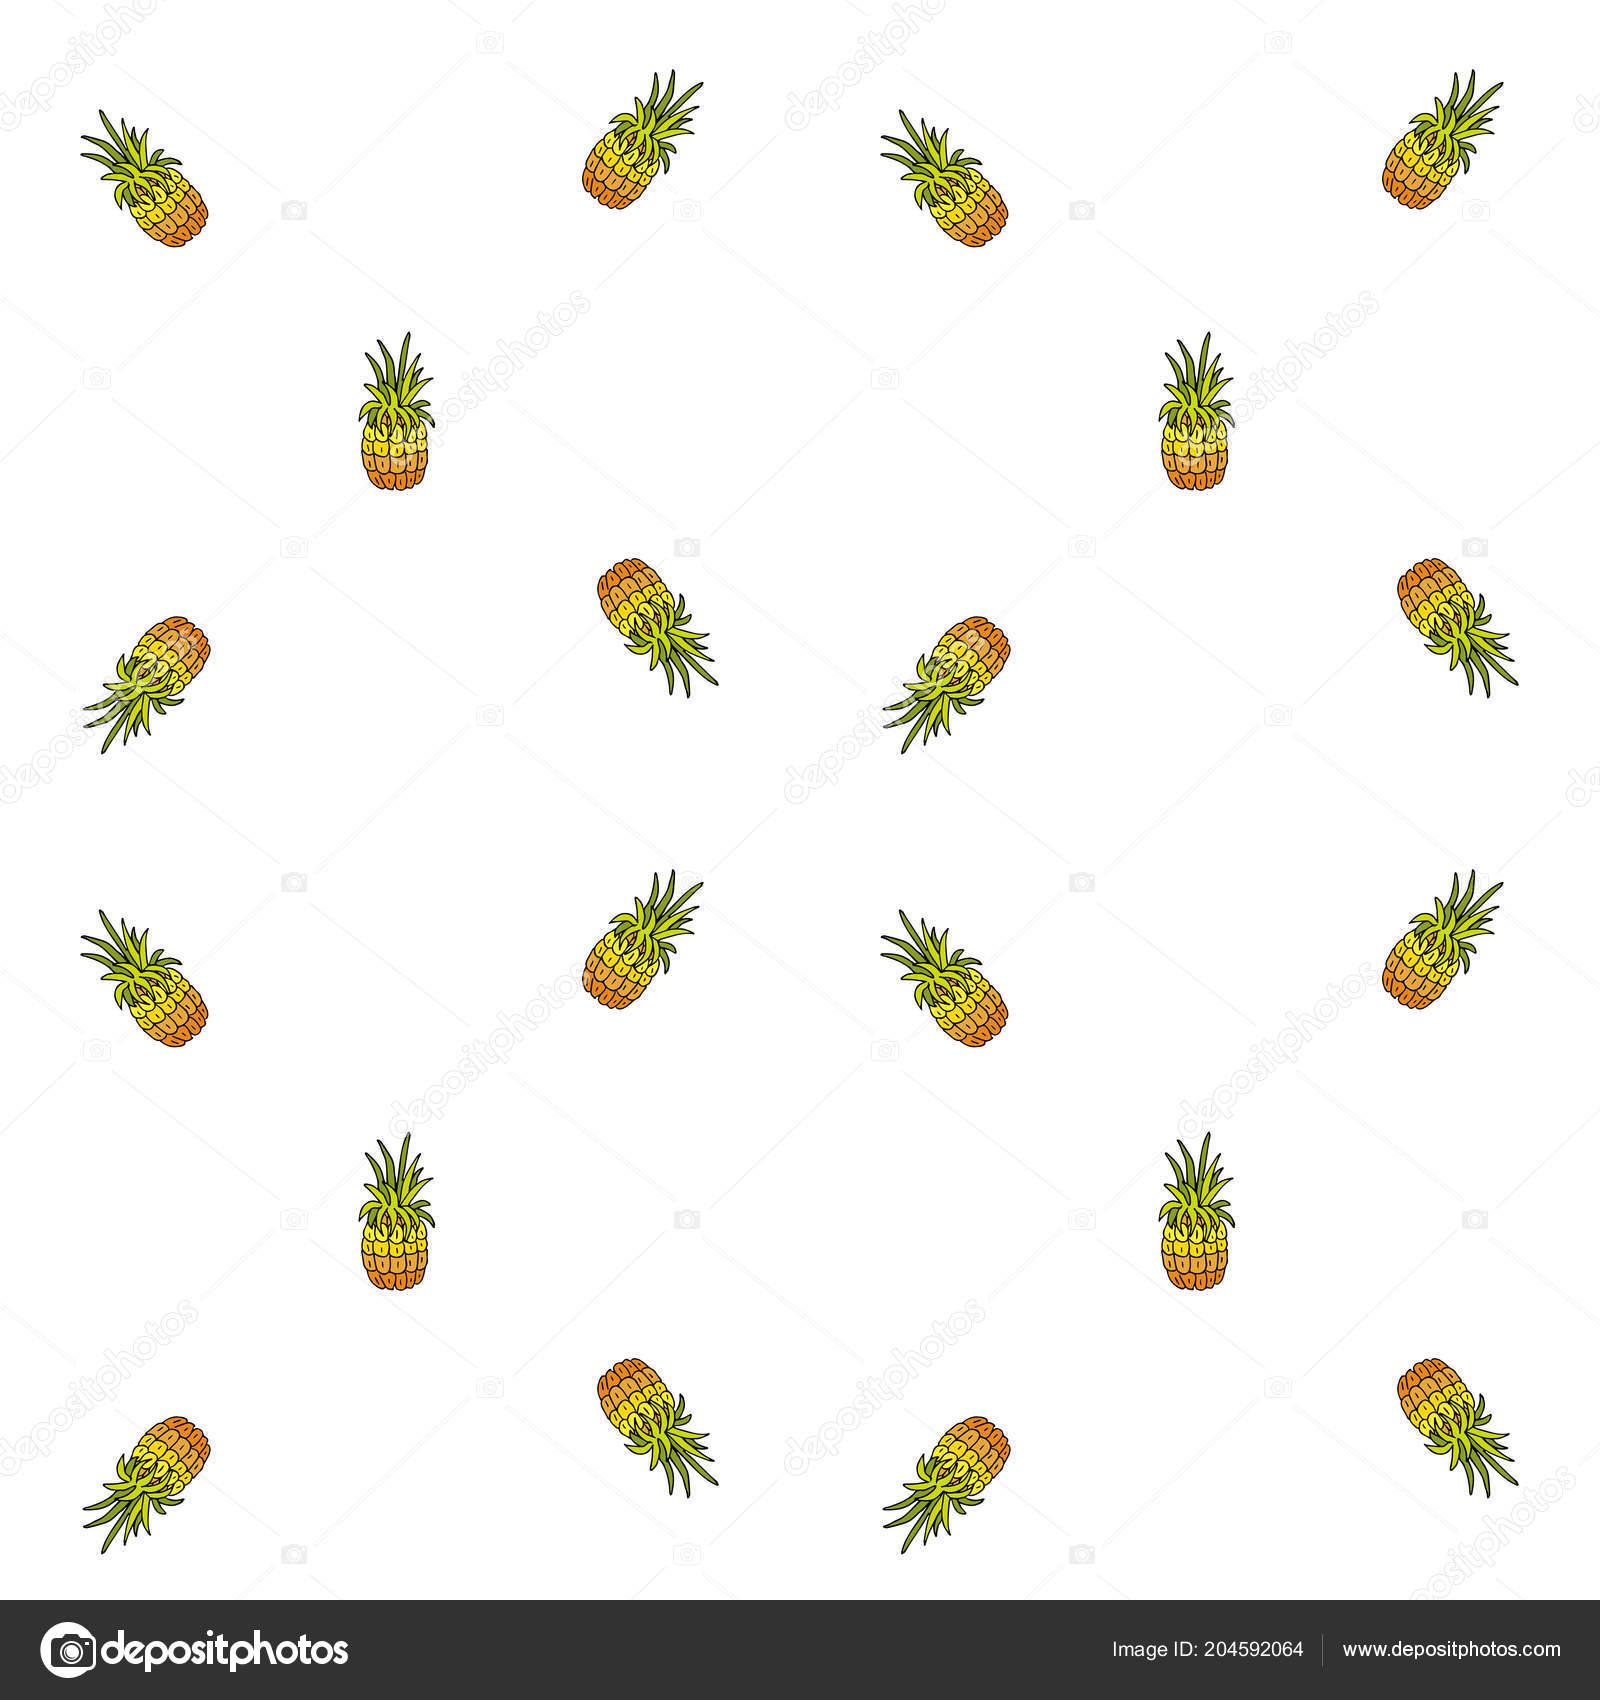 Dessinés Main Doodle Icônes Ananas Fruits Modèle Seamless